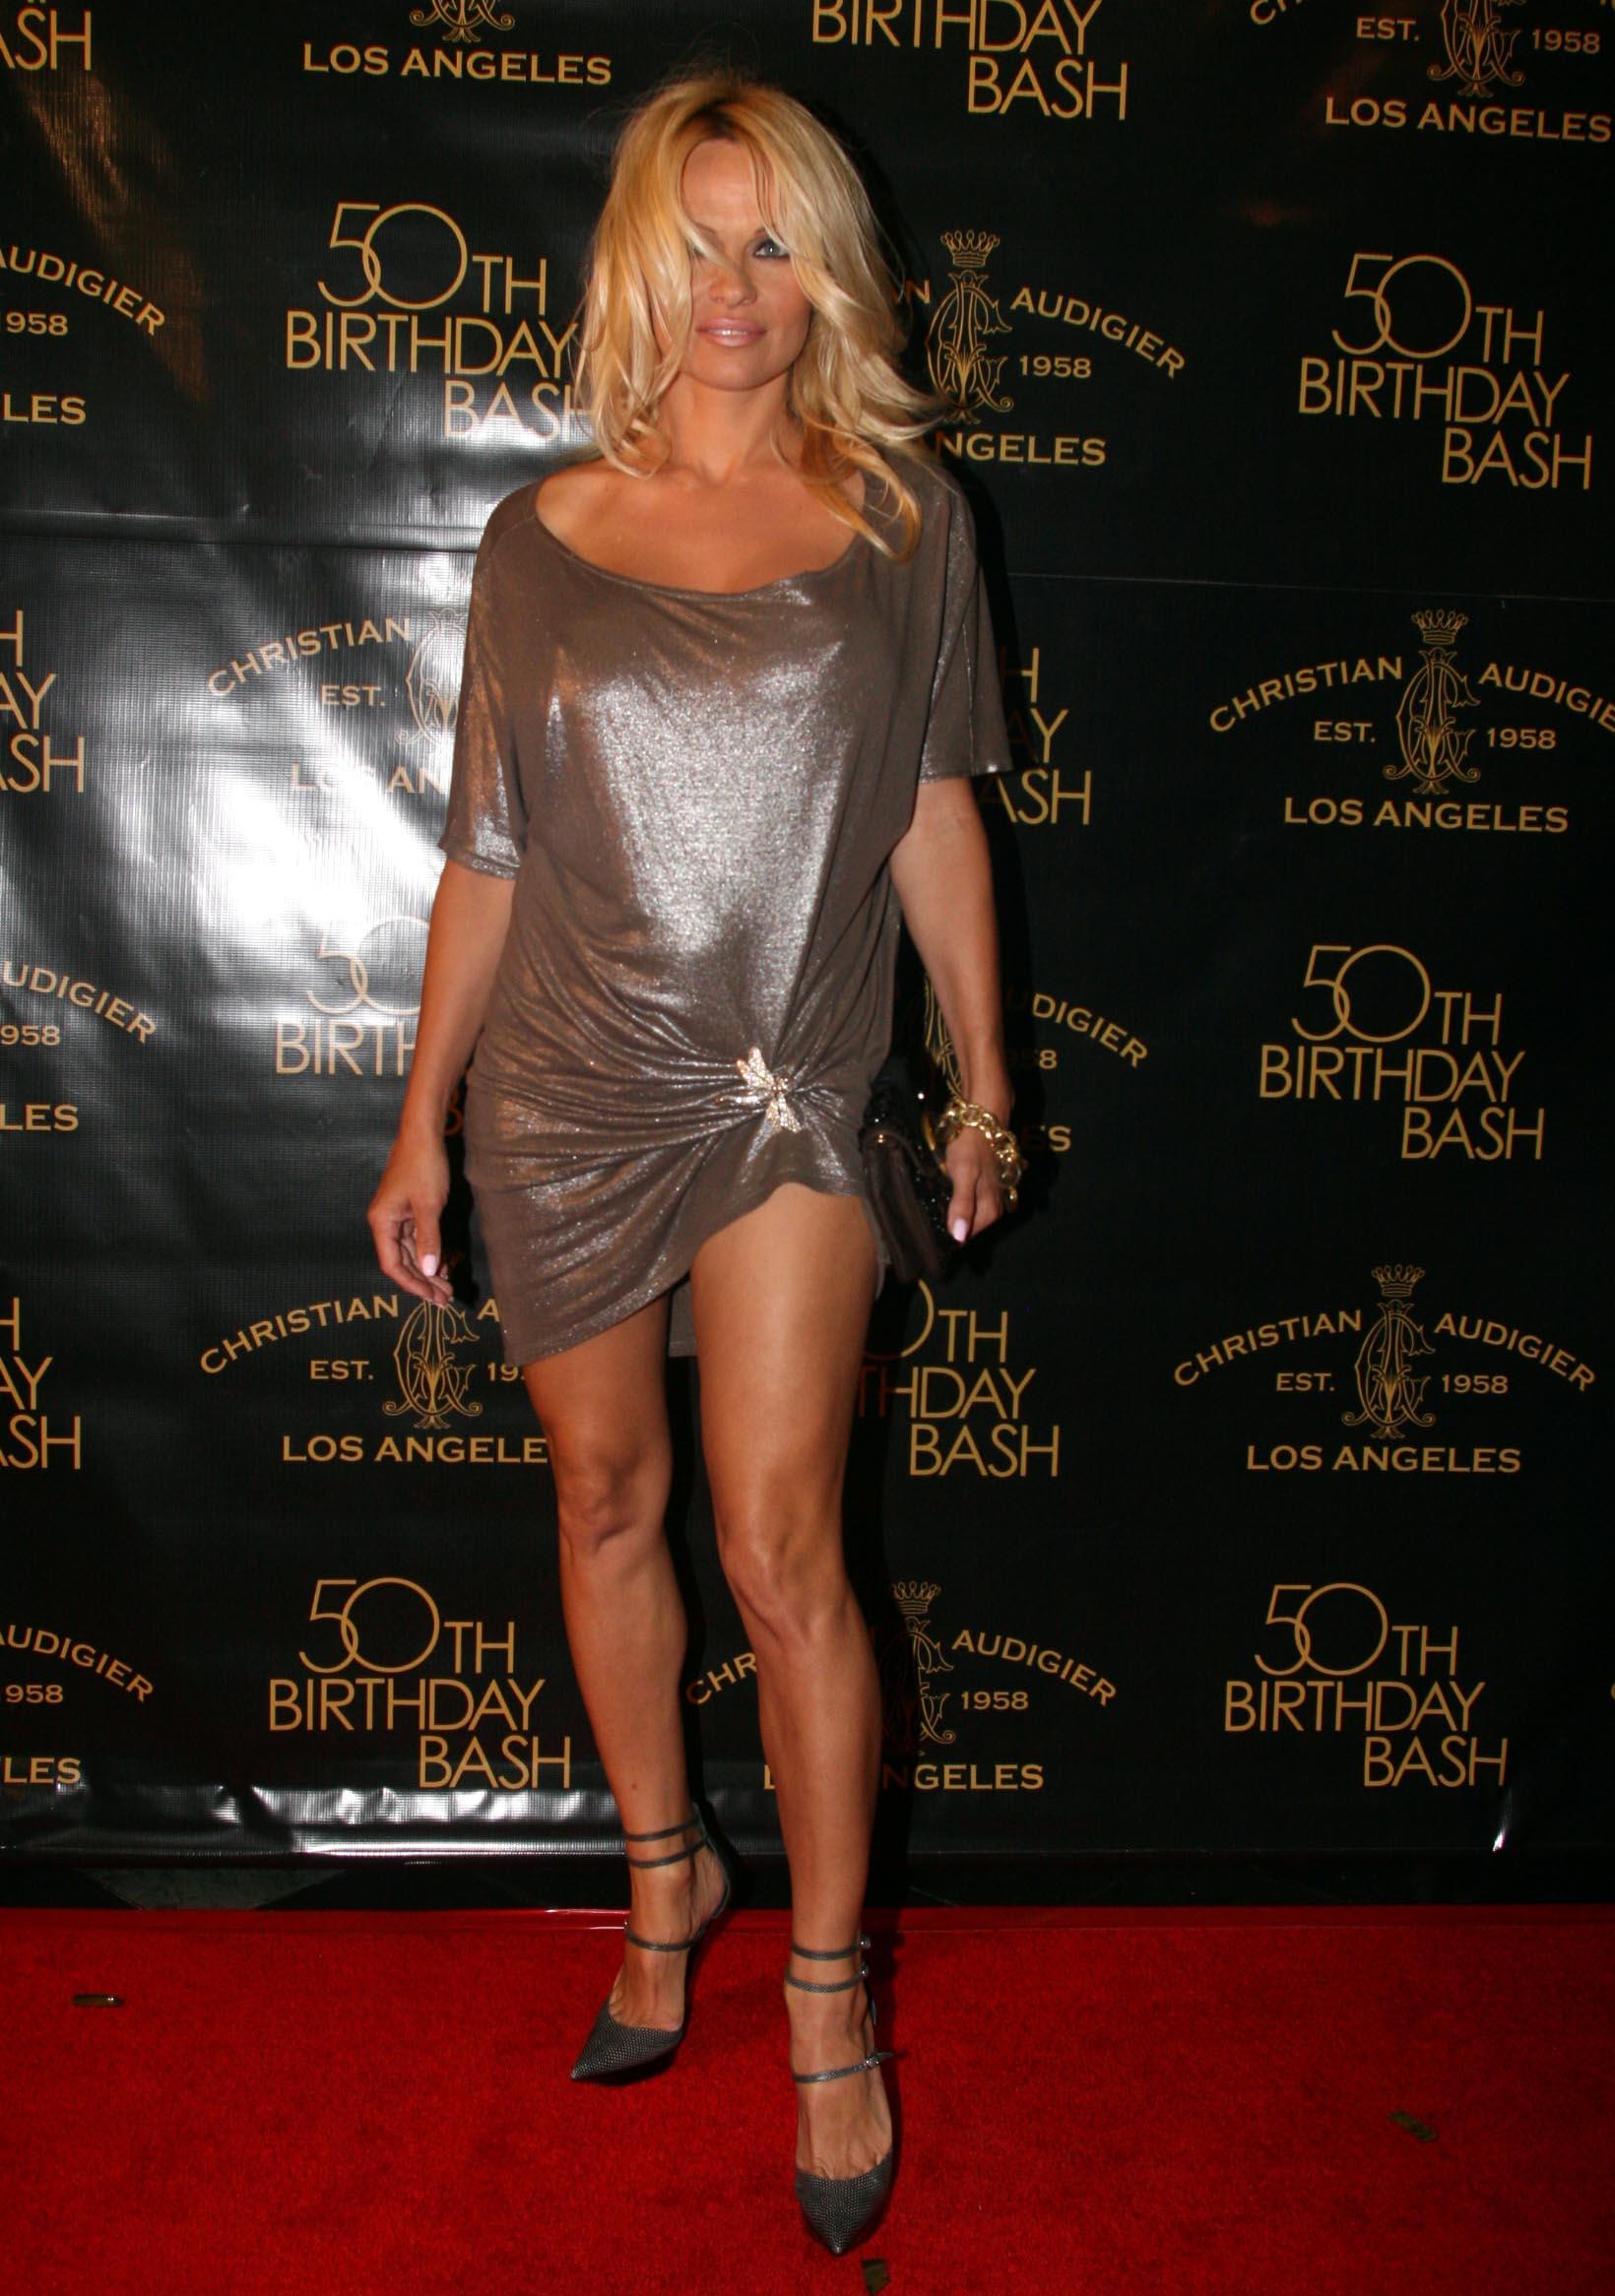 49089_Celebutopia-Pamela_Anderson-Designer_Christian_Audigier6s_50th_Birthday_Bash-05_122_923lo.jpg